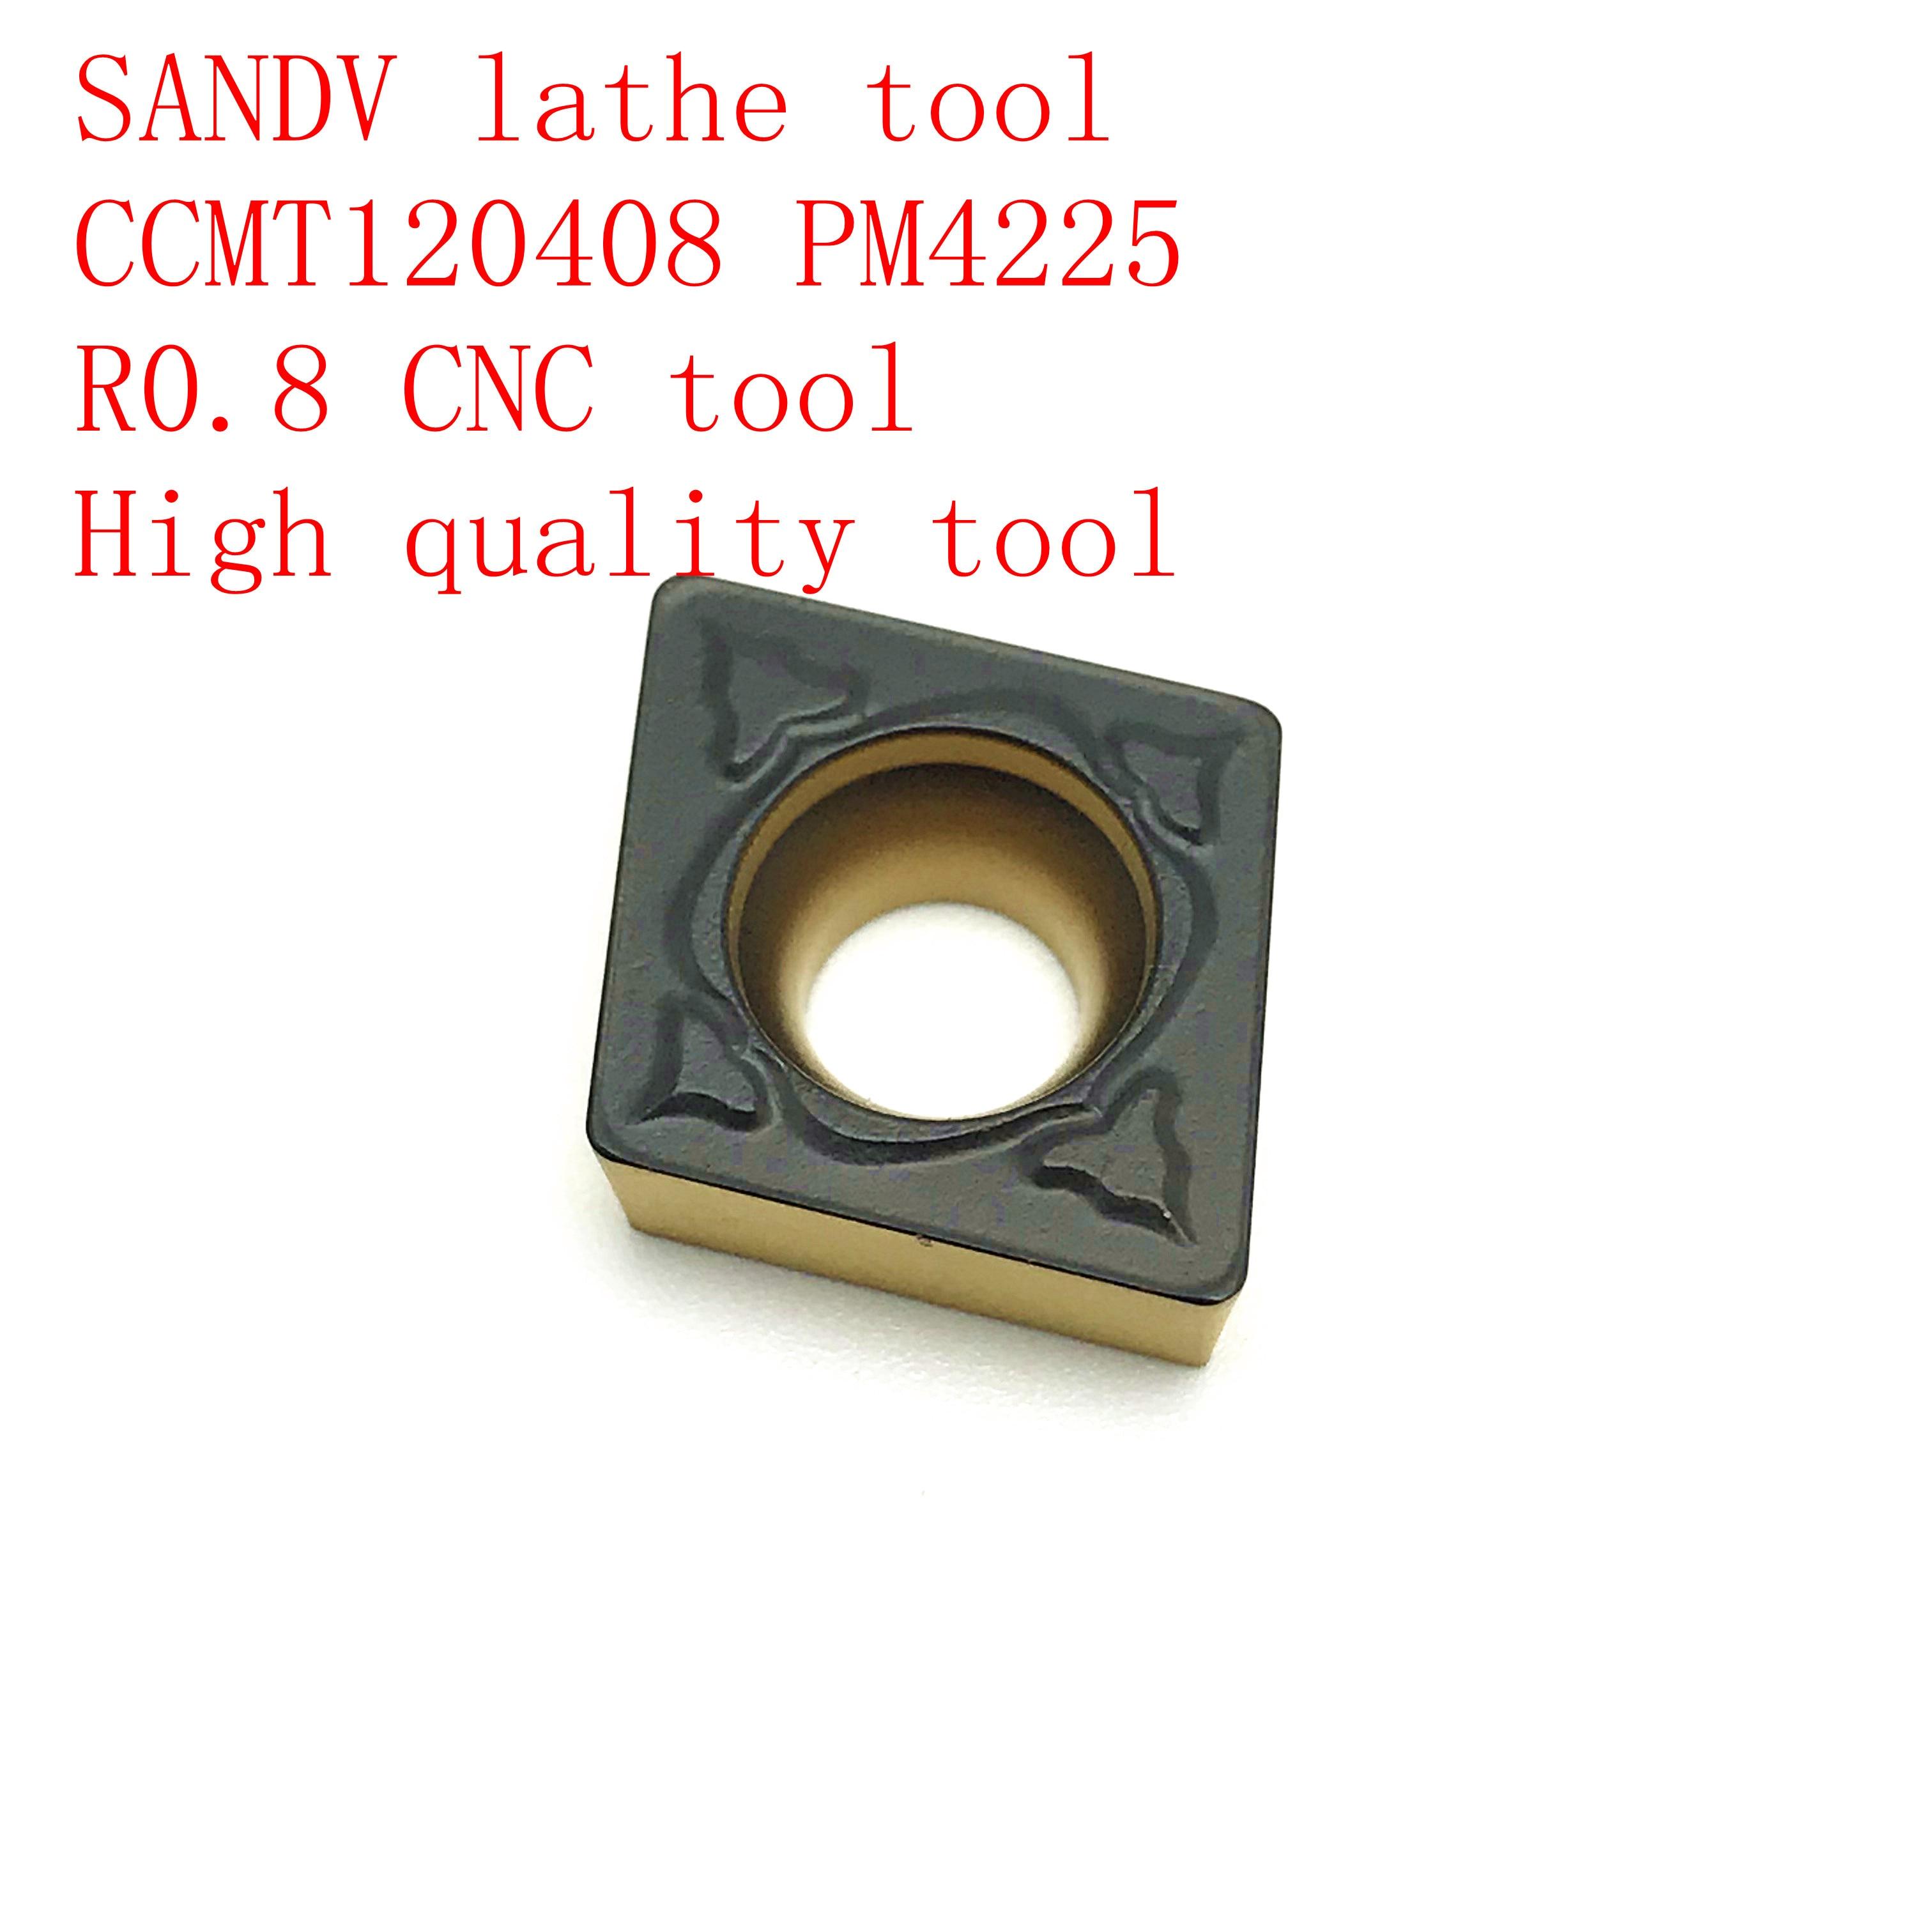 SANDV high quality lathe tool CCMT120408 PM4225 carbide tool internal turning tool R0 8 CNC lathe tool semi finishing tool in Turning Tool from Tools